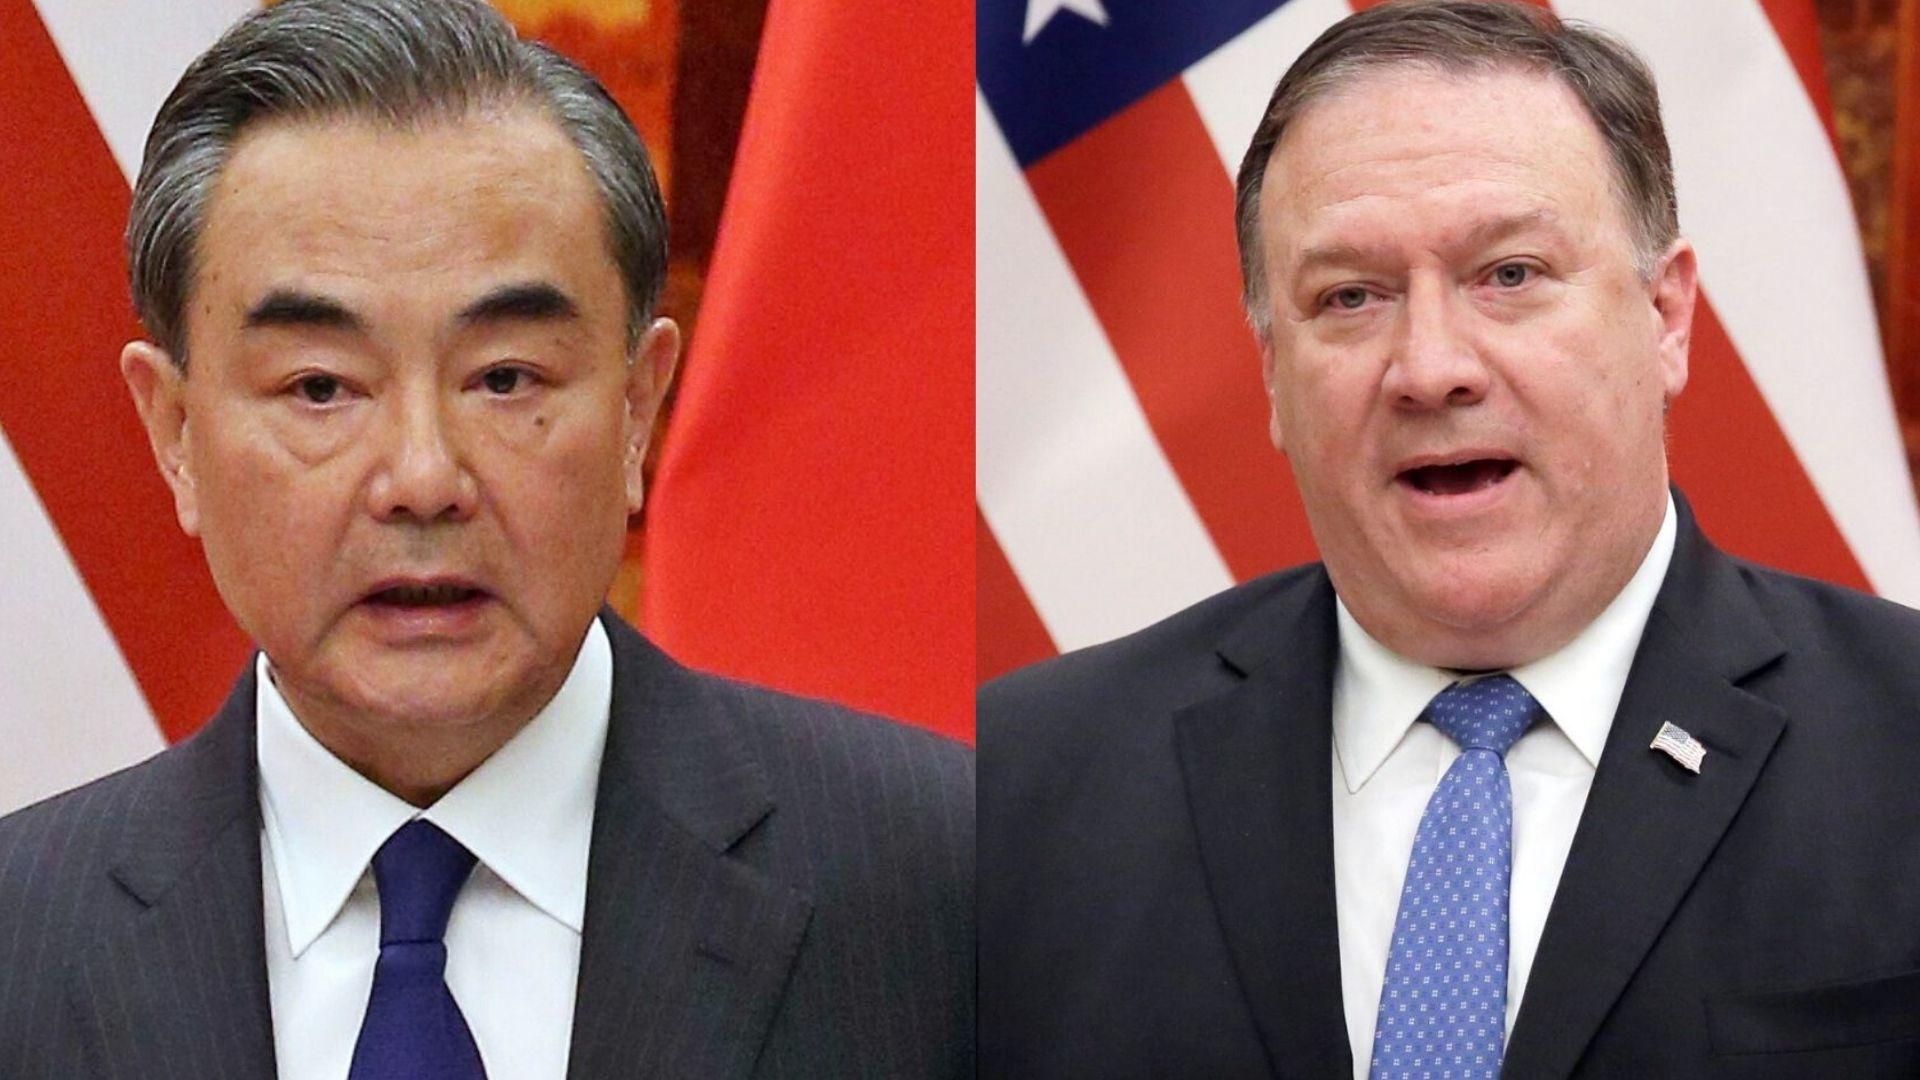 China: US claims on coronavirus origins 'groundless'